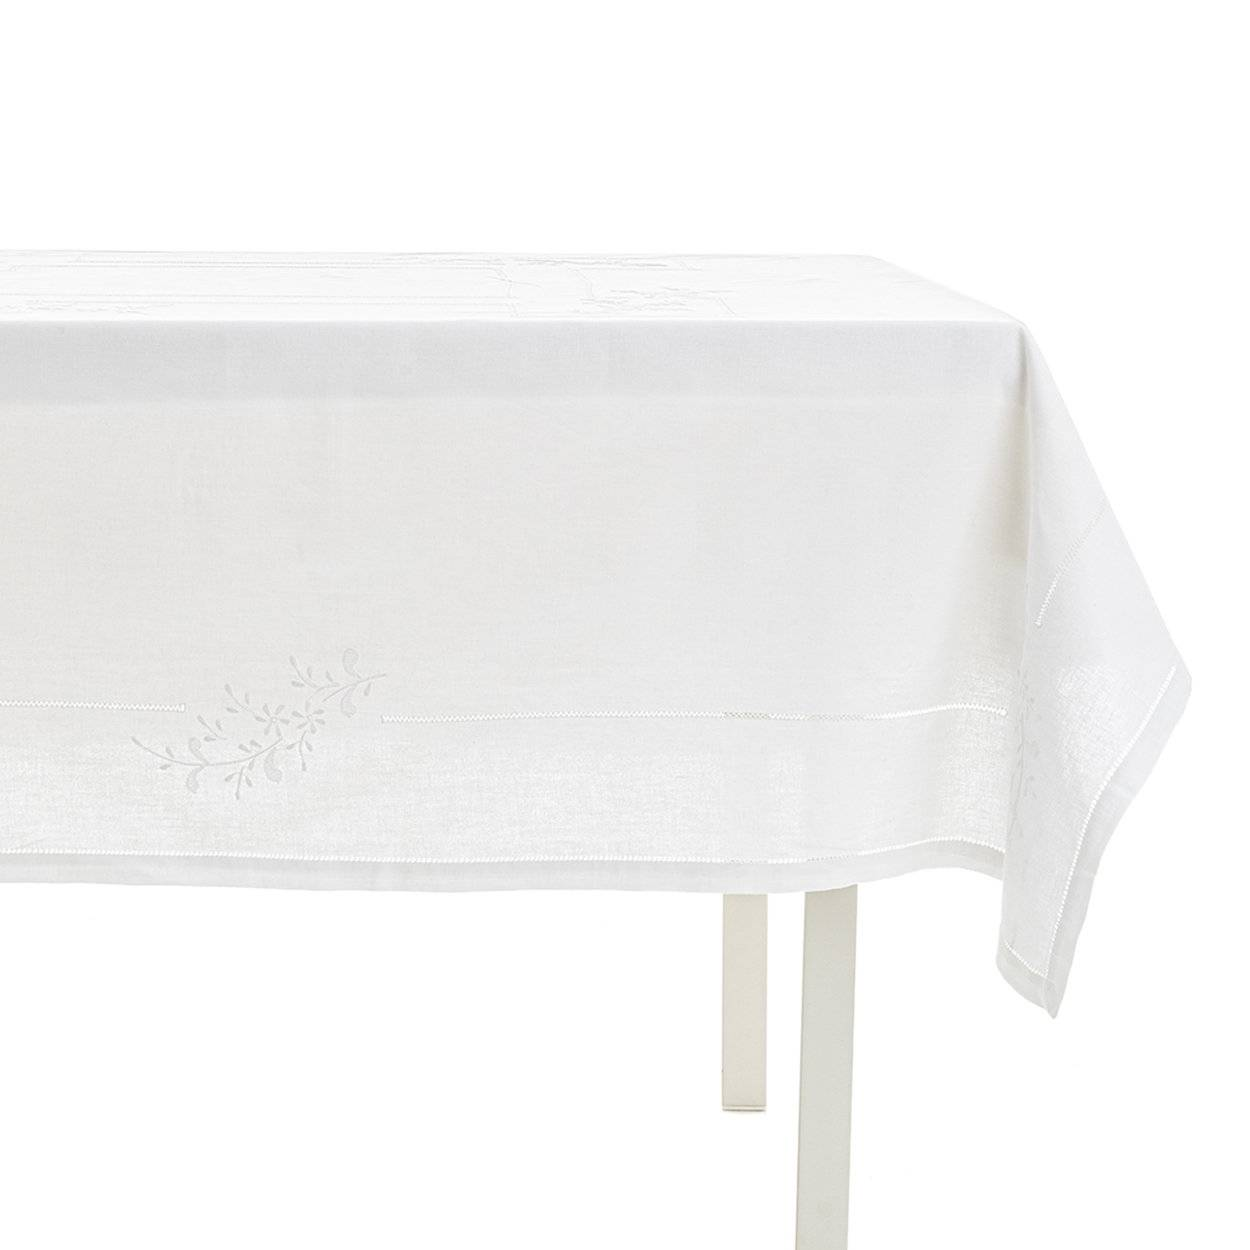 Zenoni & Colombi Tovaglia Francesca quadrata 180x180 8p bianco